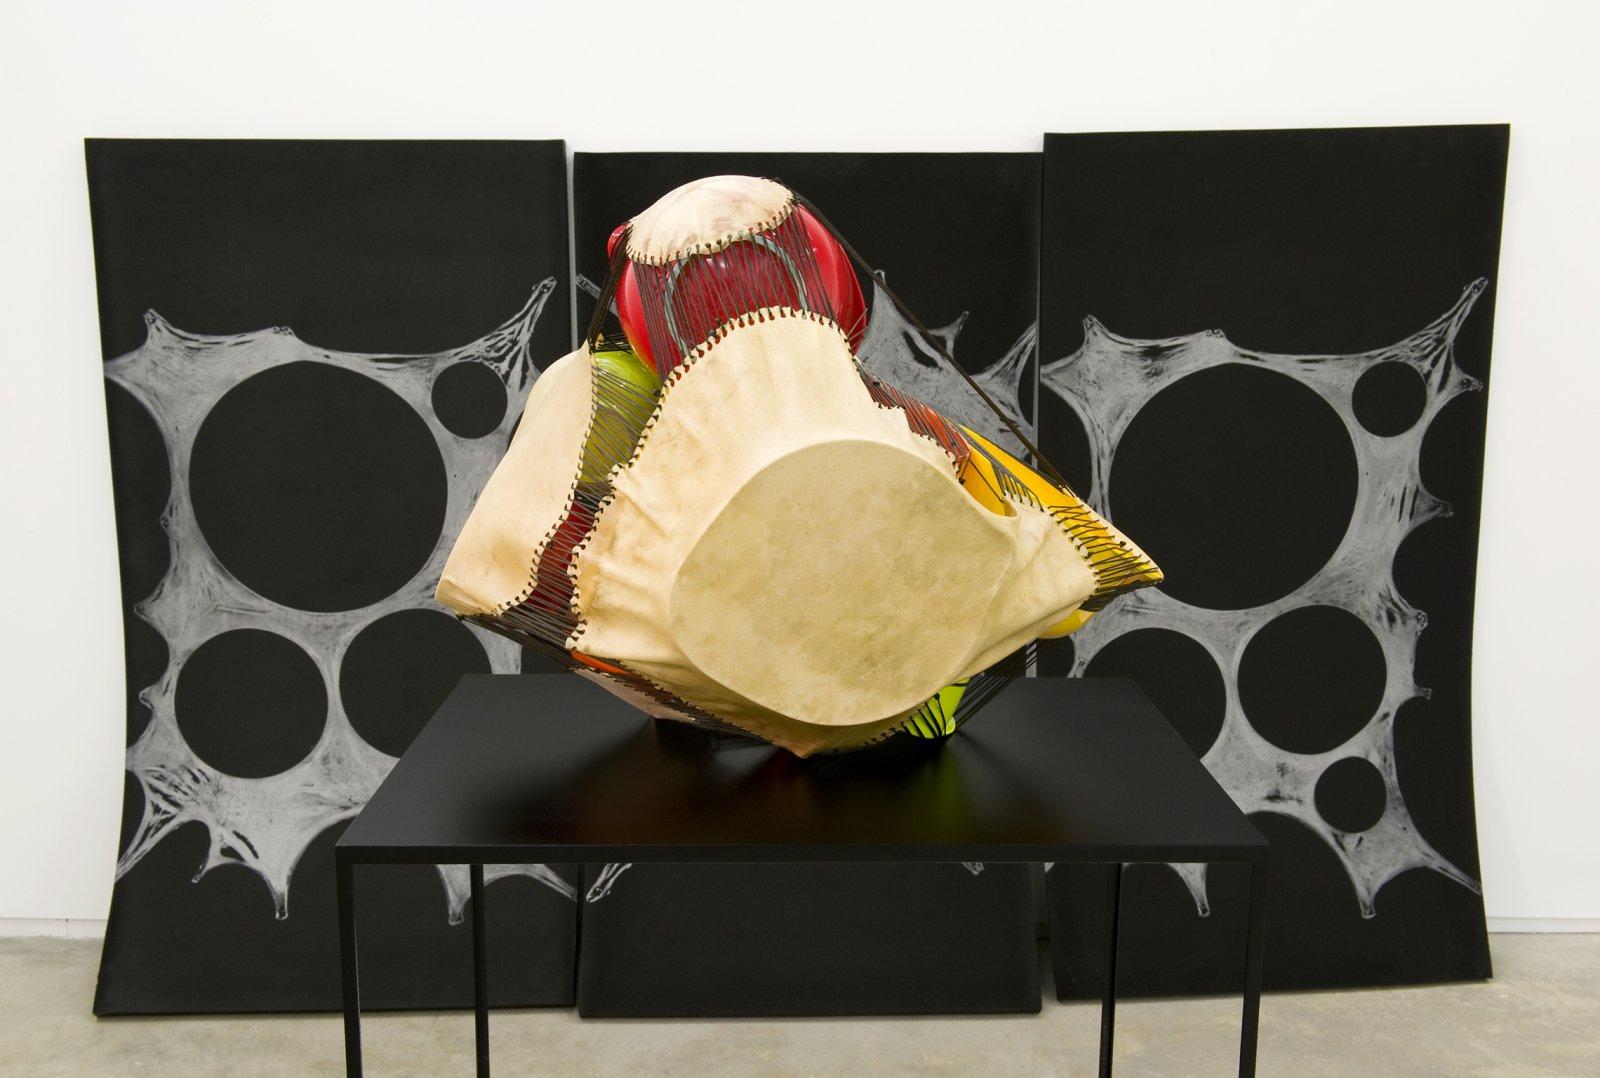 Brian Jungen,Subject, Silver, Prism (detail), 2011,foam, silver relief ink, plastic bowls, deer hide, tarred twine, steel, 78 x 120 x 300 in. (198 x 305 x 762 cm)